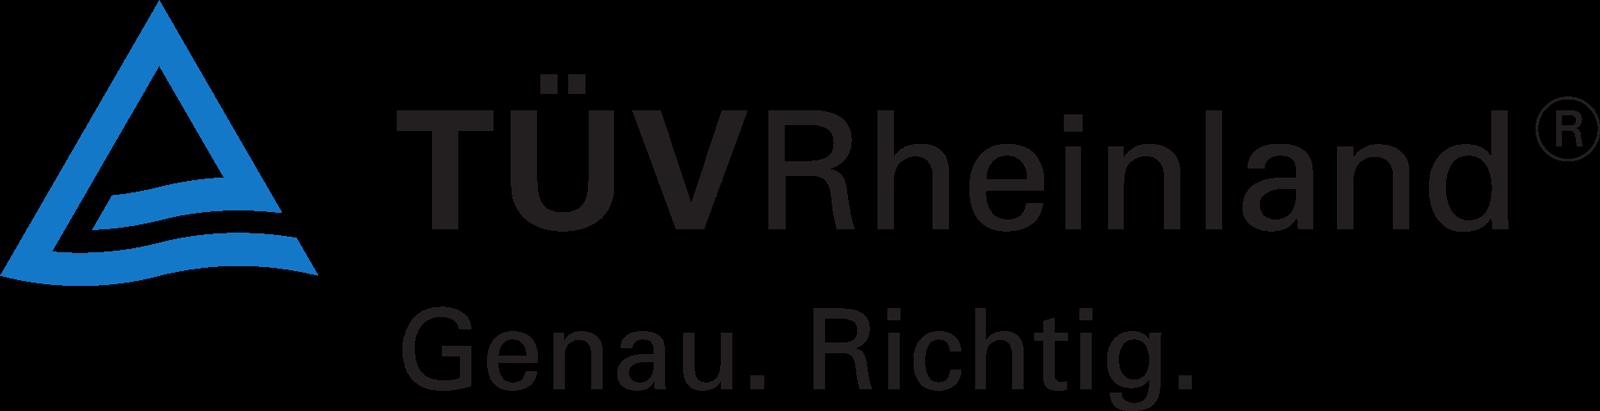 TÜV Rheinland LGA Products GmbH